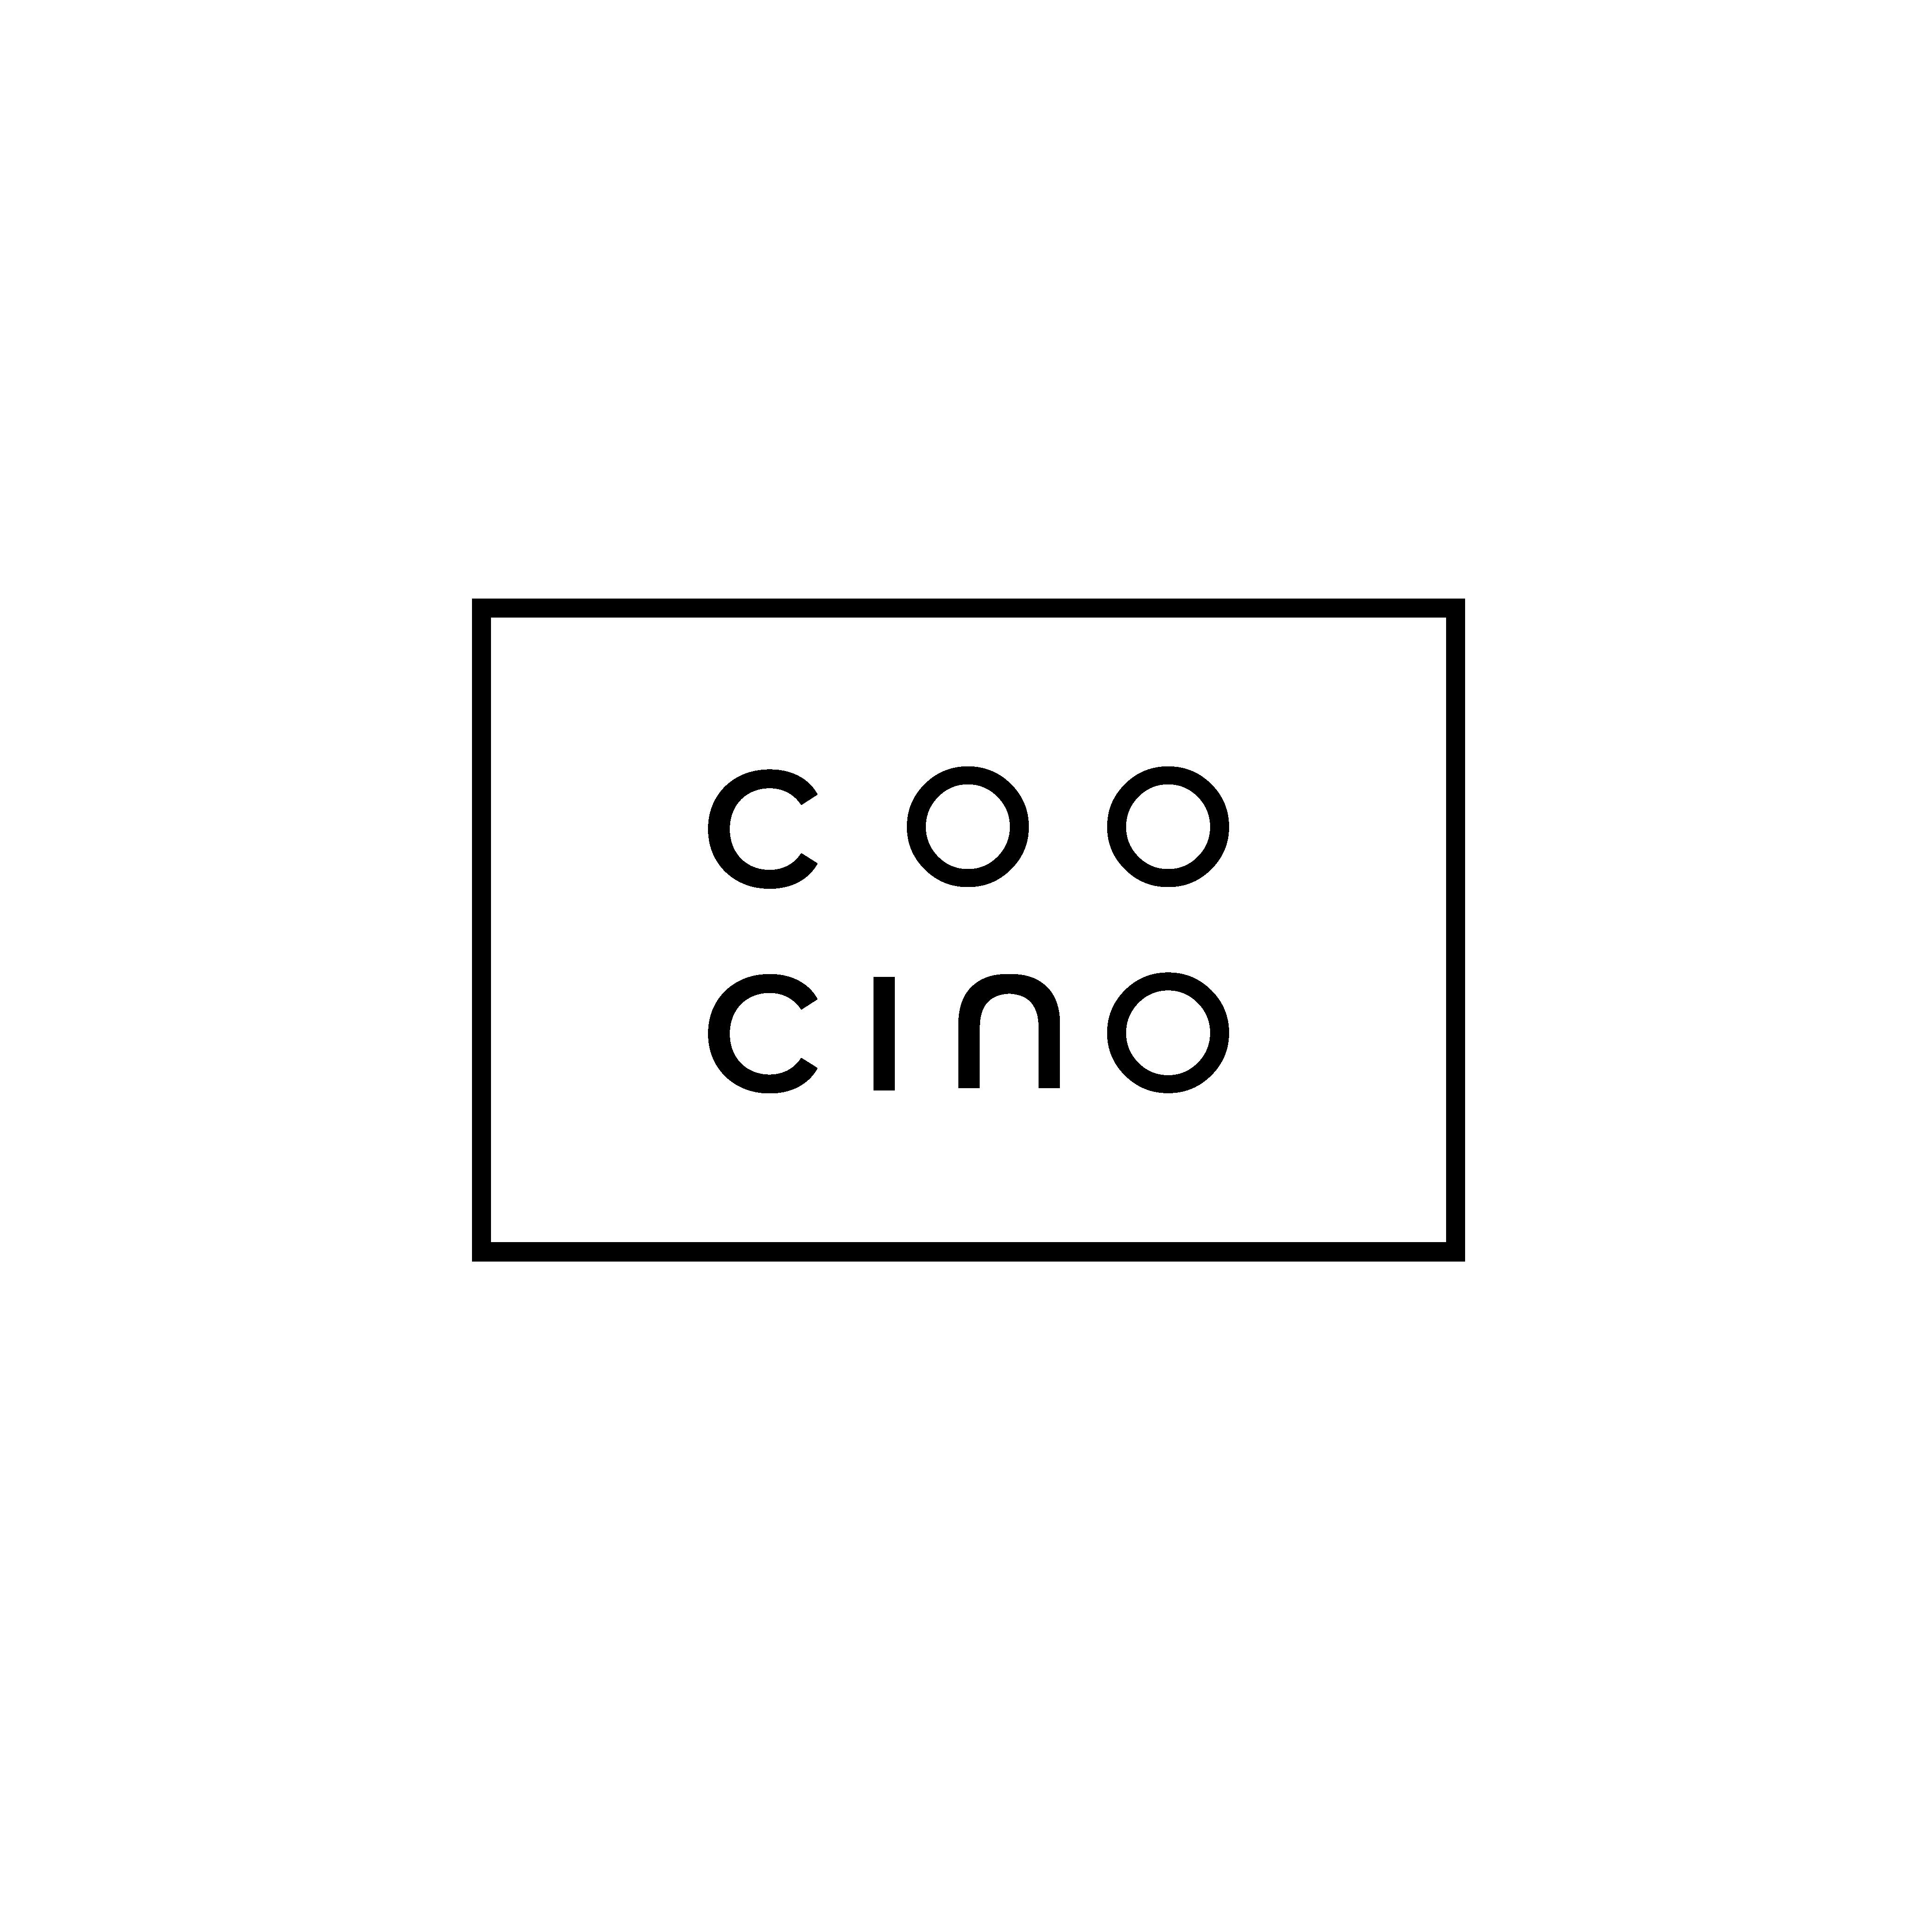 coocino rectangle white rgb-01